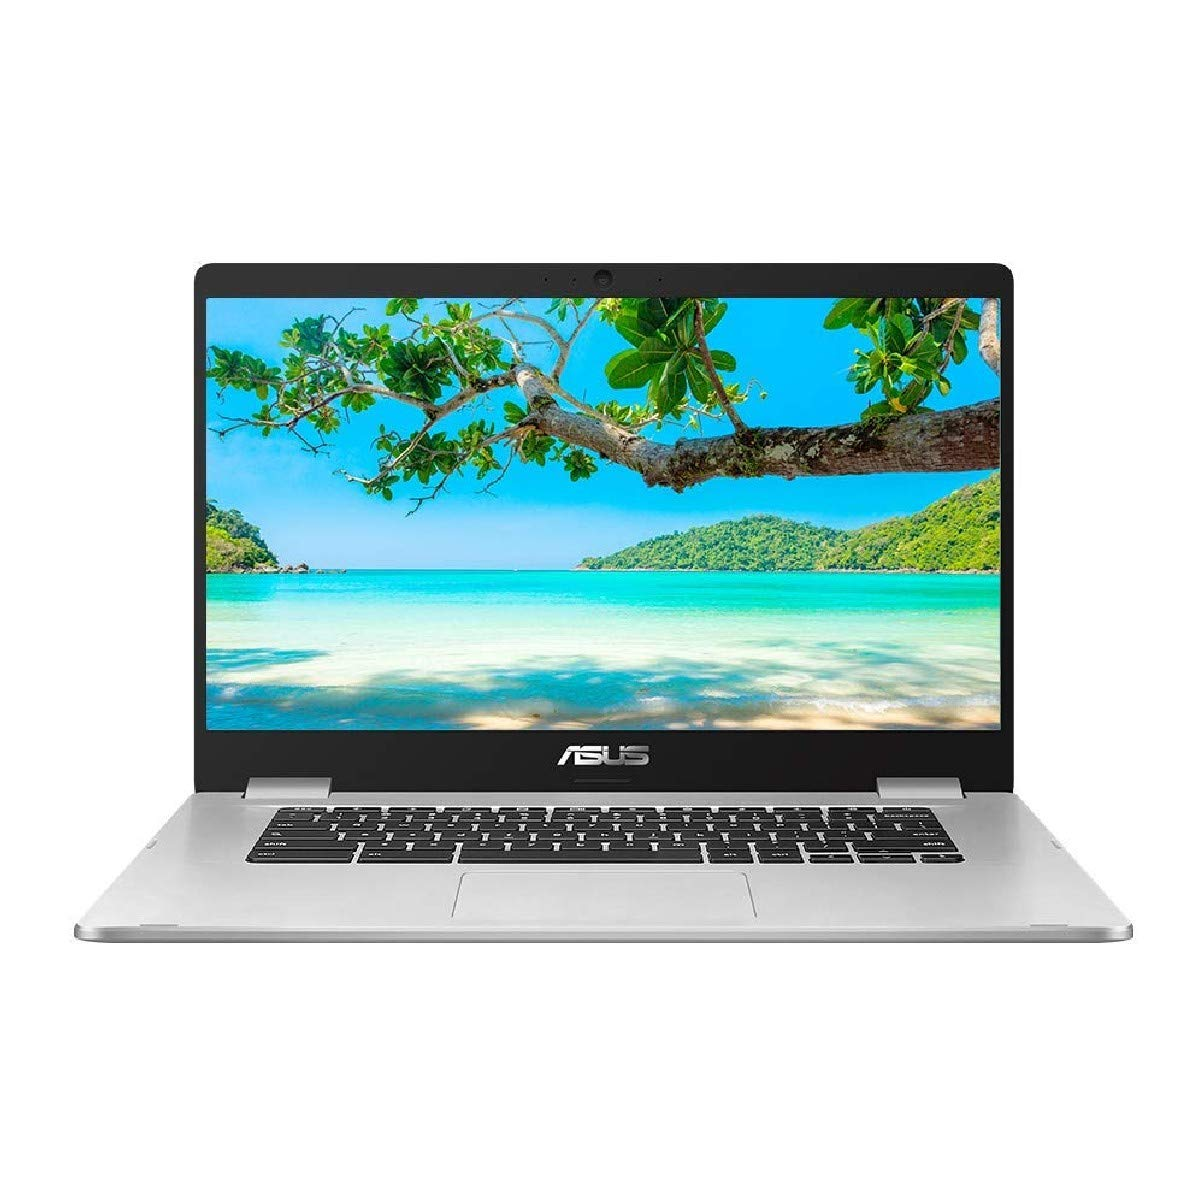 ASUS 15.6 Inch Touchscreen ChromeBook C523NA Full HD Laptop (Intel Pentium N4200 Processor, 4 GB RAM, 64GB eMMC, Chrome OS, Full HD Touchscreen)